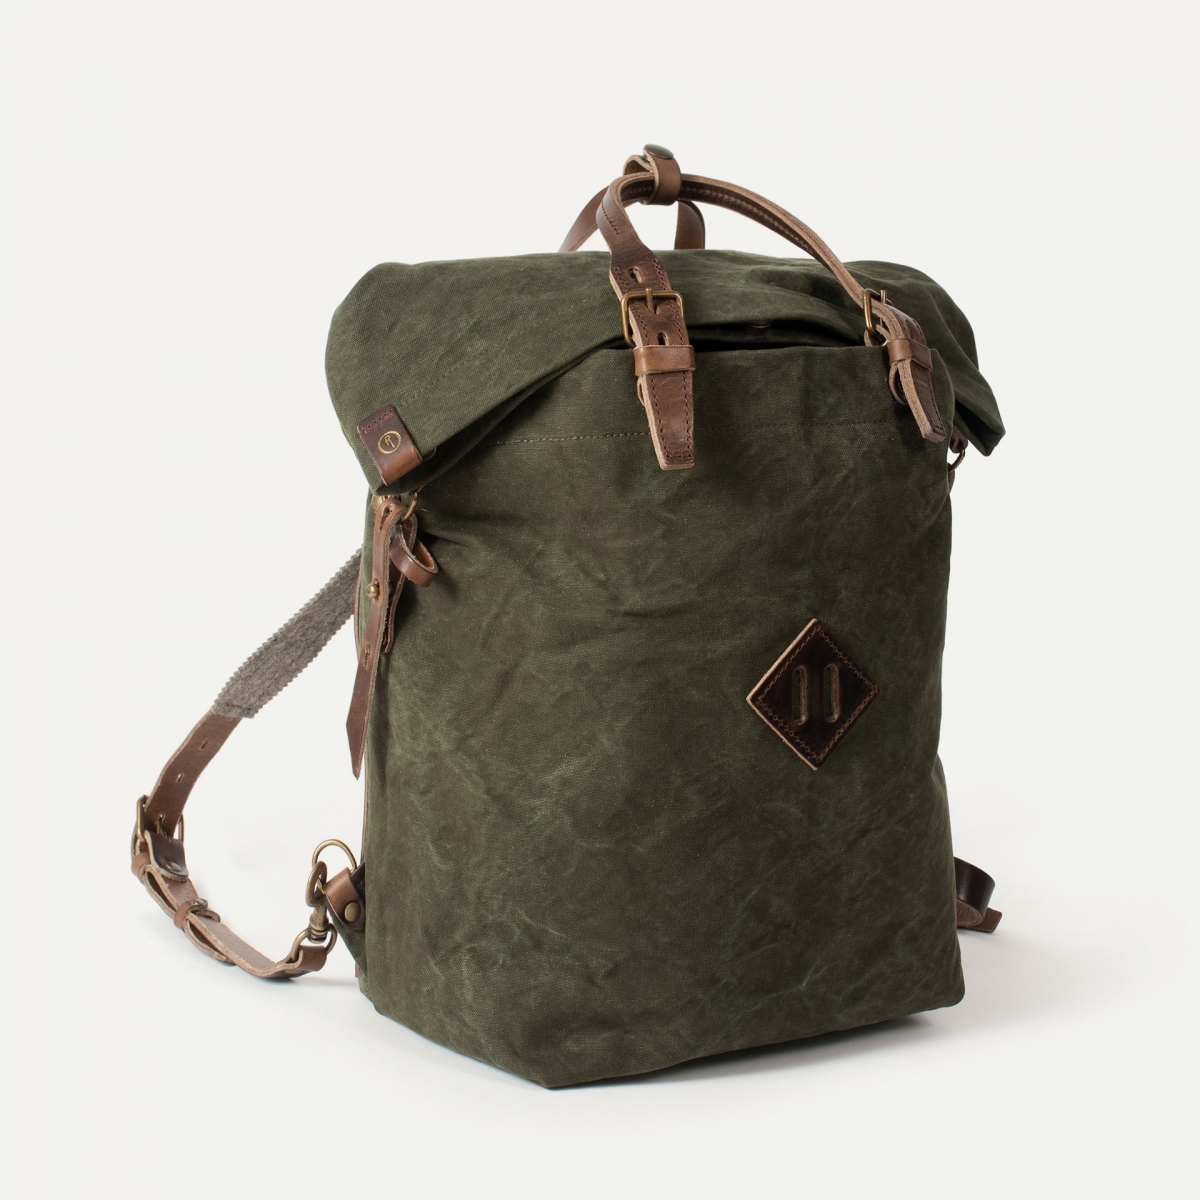 Woody M Backpack - Dark Khaki (image n°2)